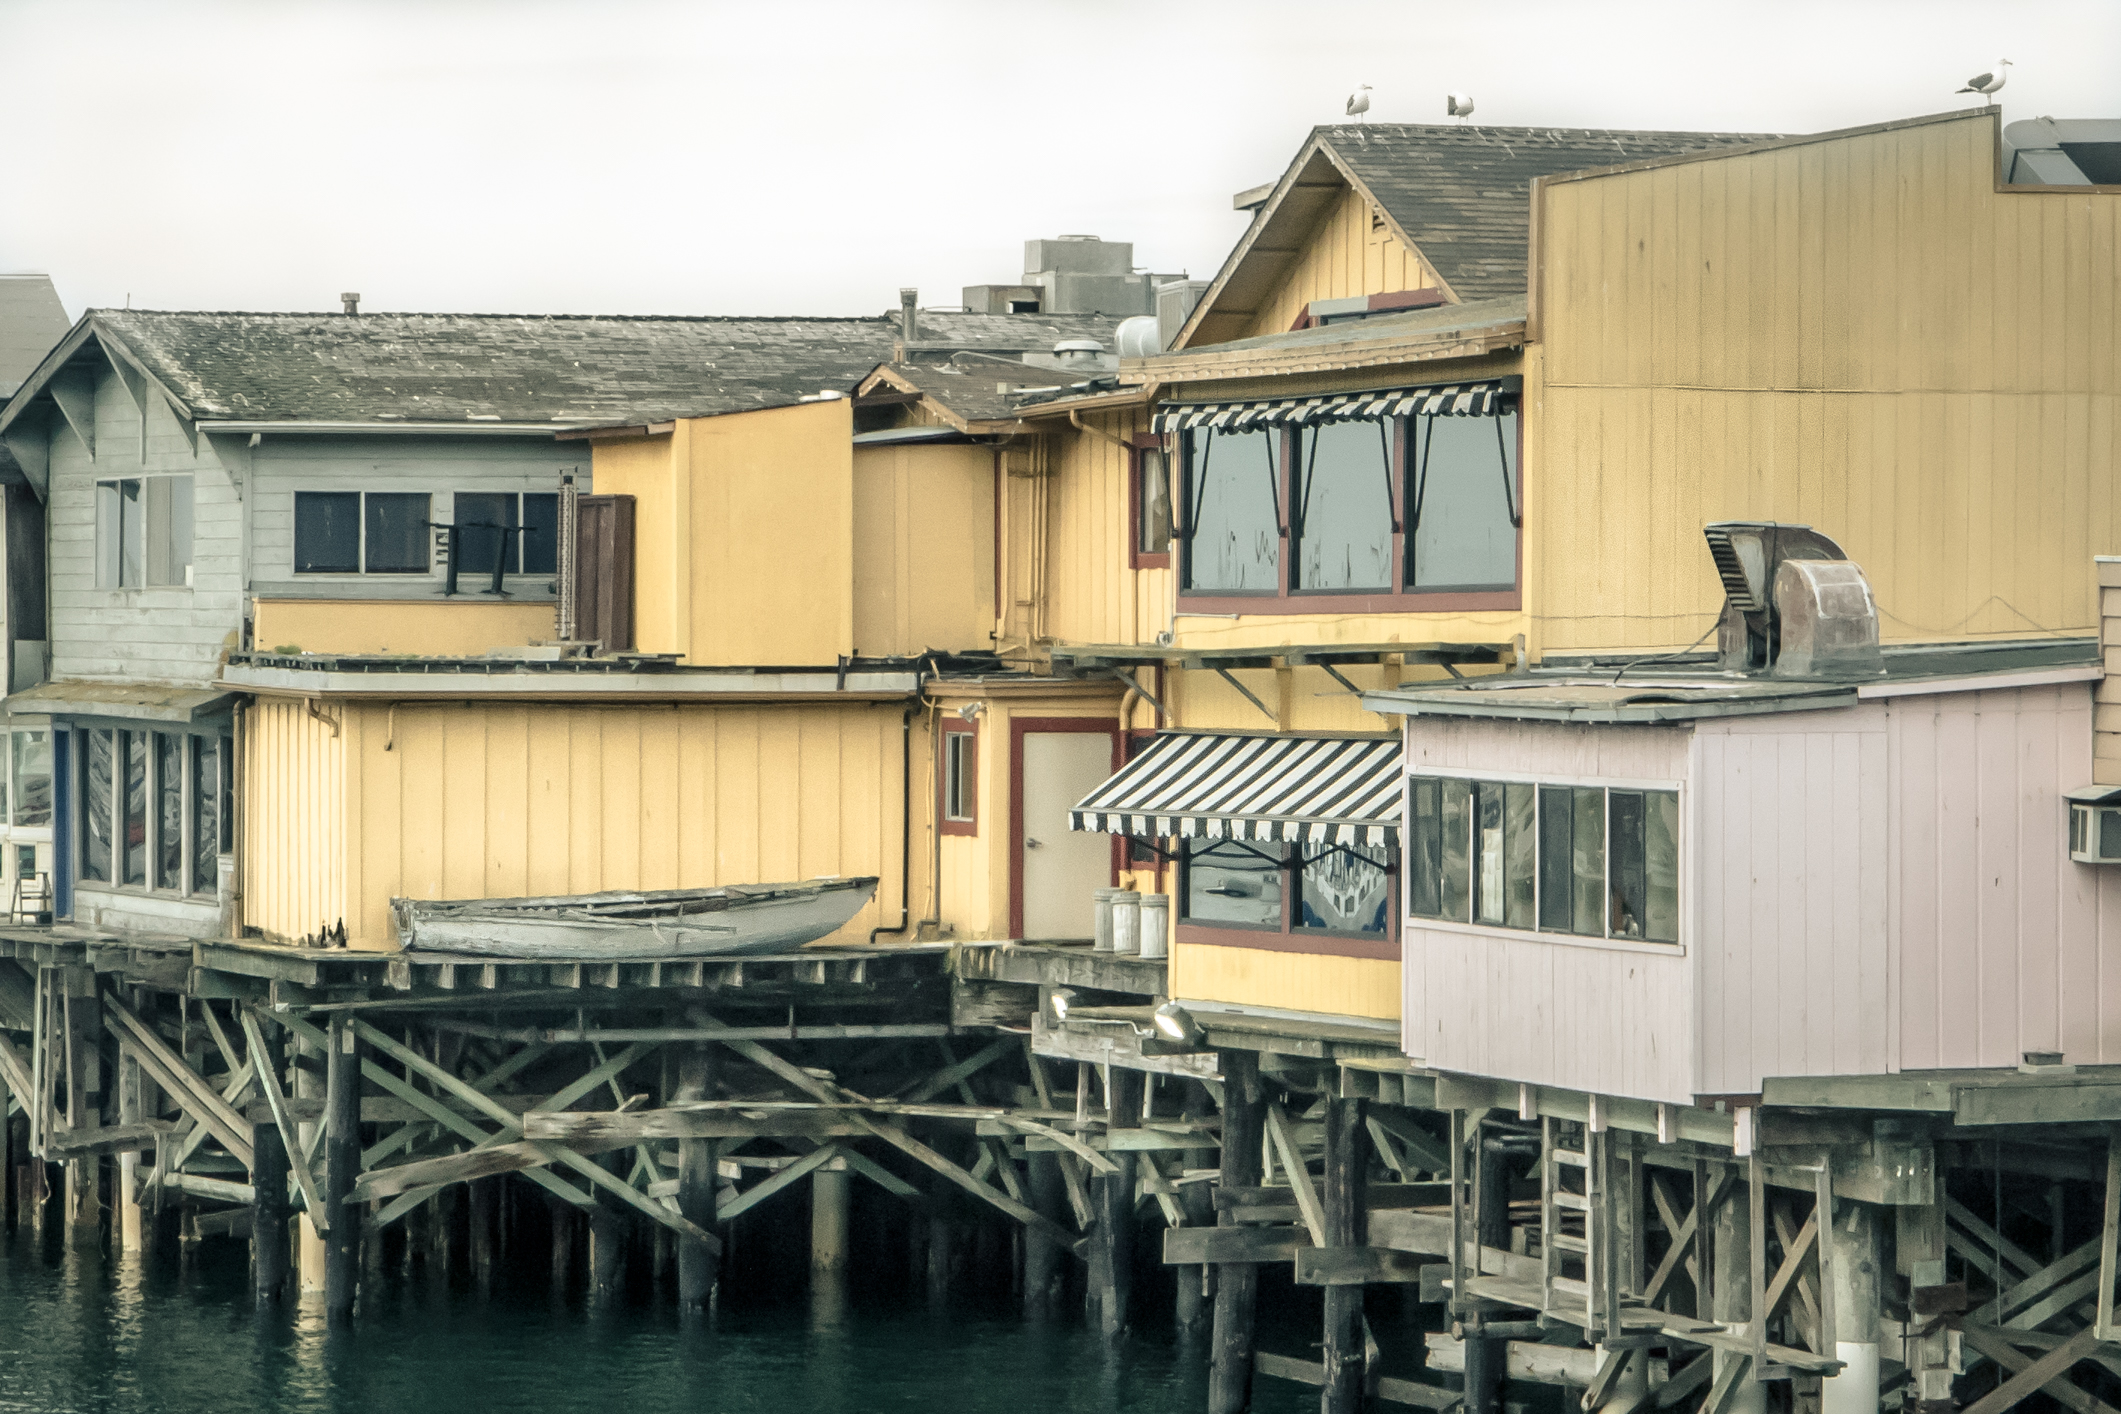 A close-up shot of the back of Fisherman's Wharf in Monterey, CA NotSoSAHM